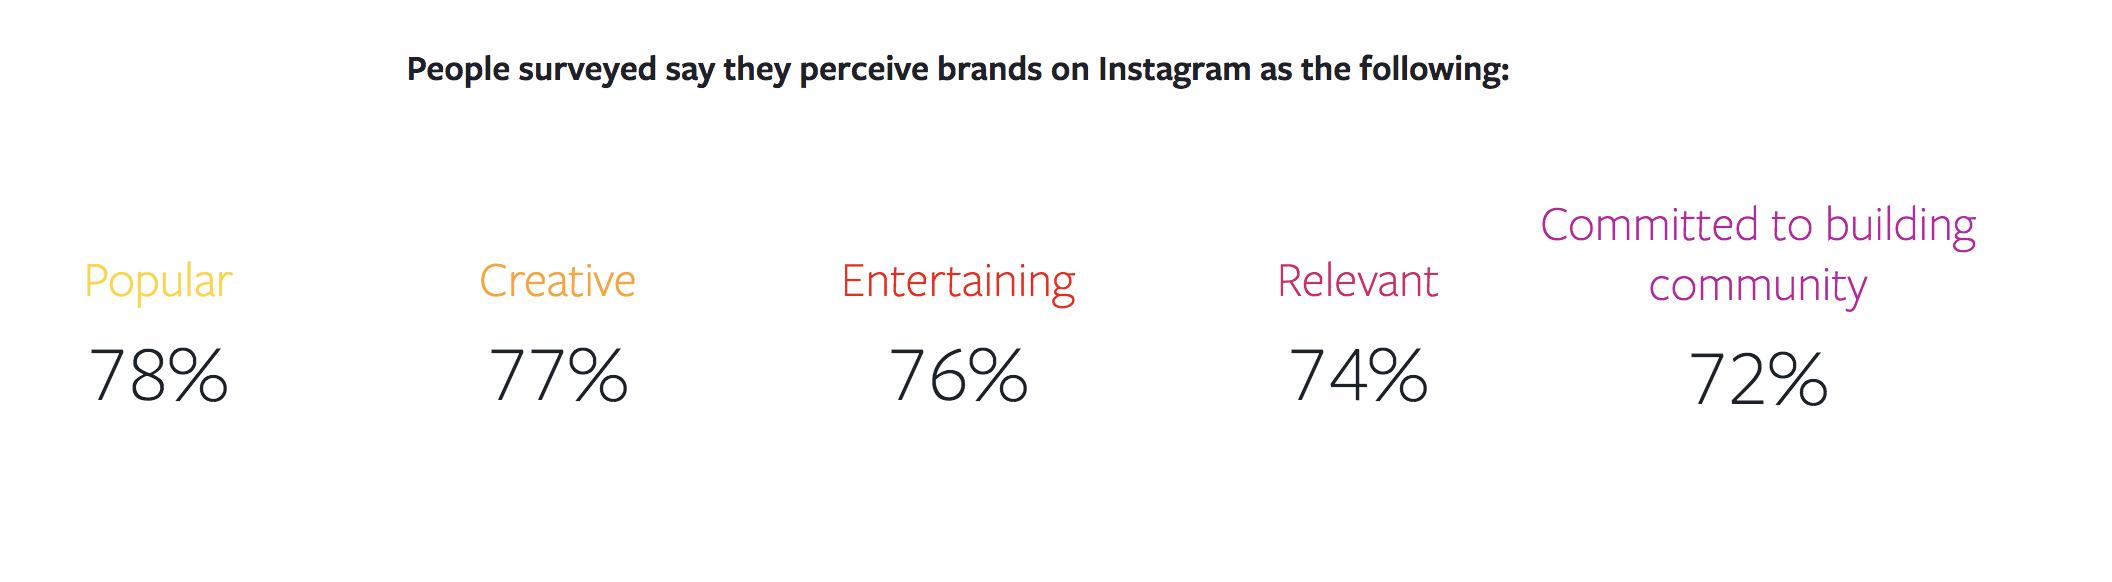 instagram-marketing-brand-perception